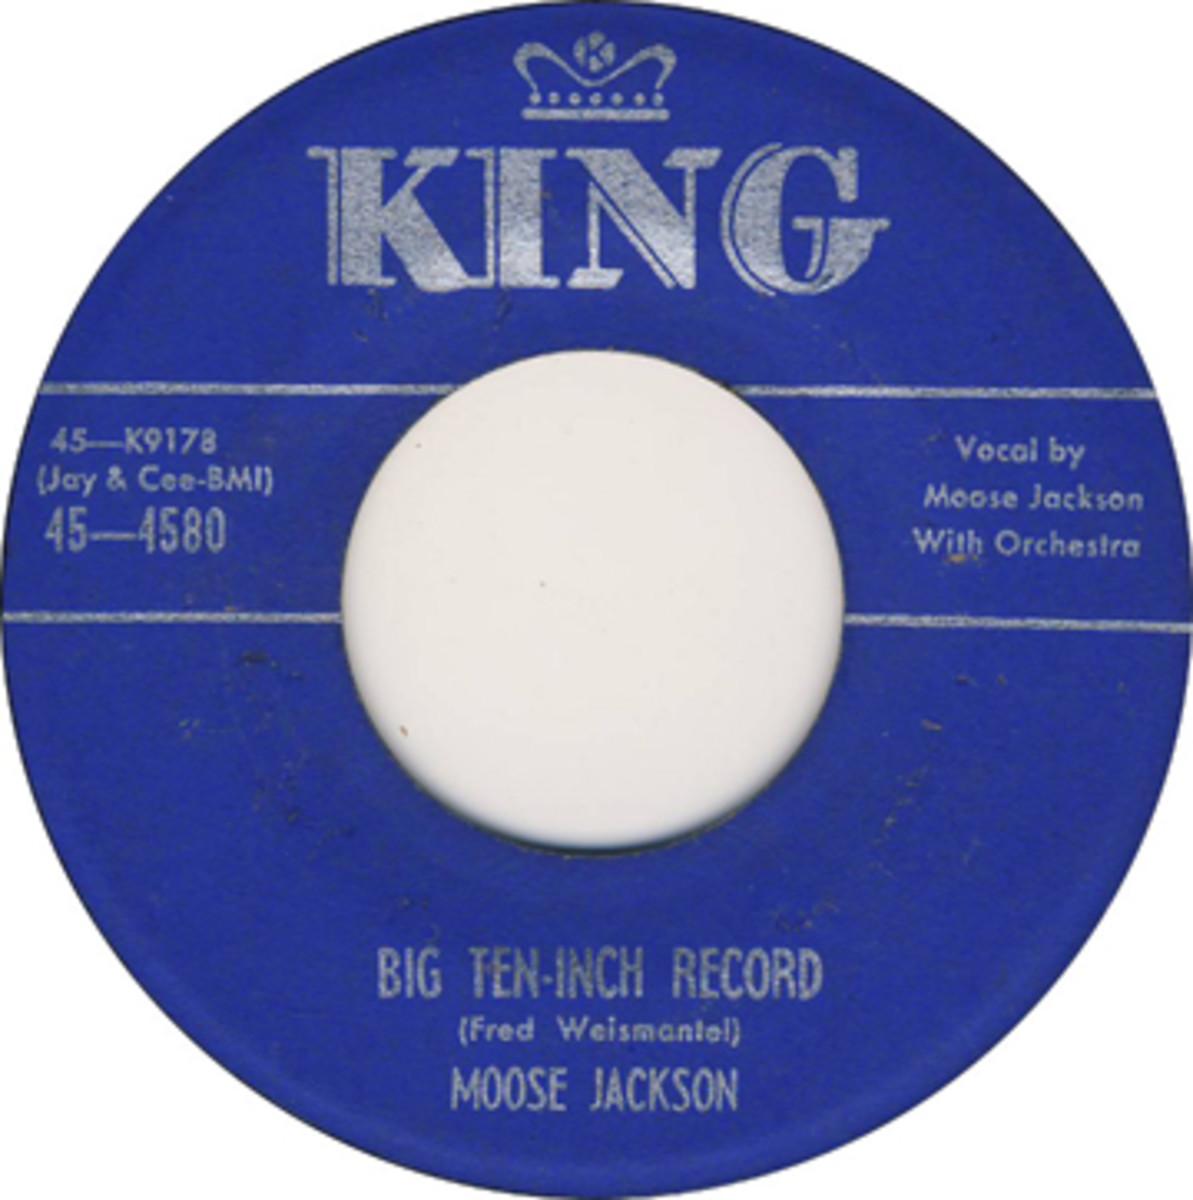 Bull Moose Jackson Big Ten Inch Record